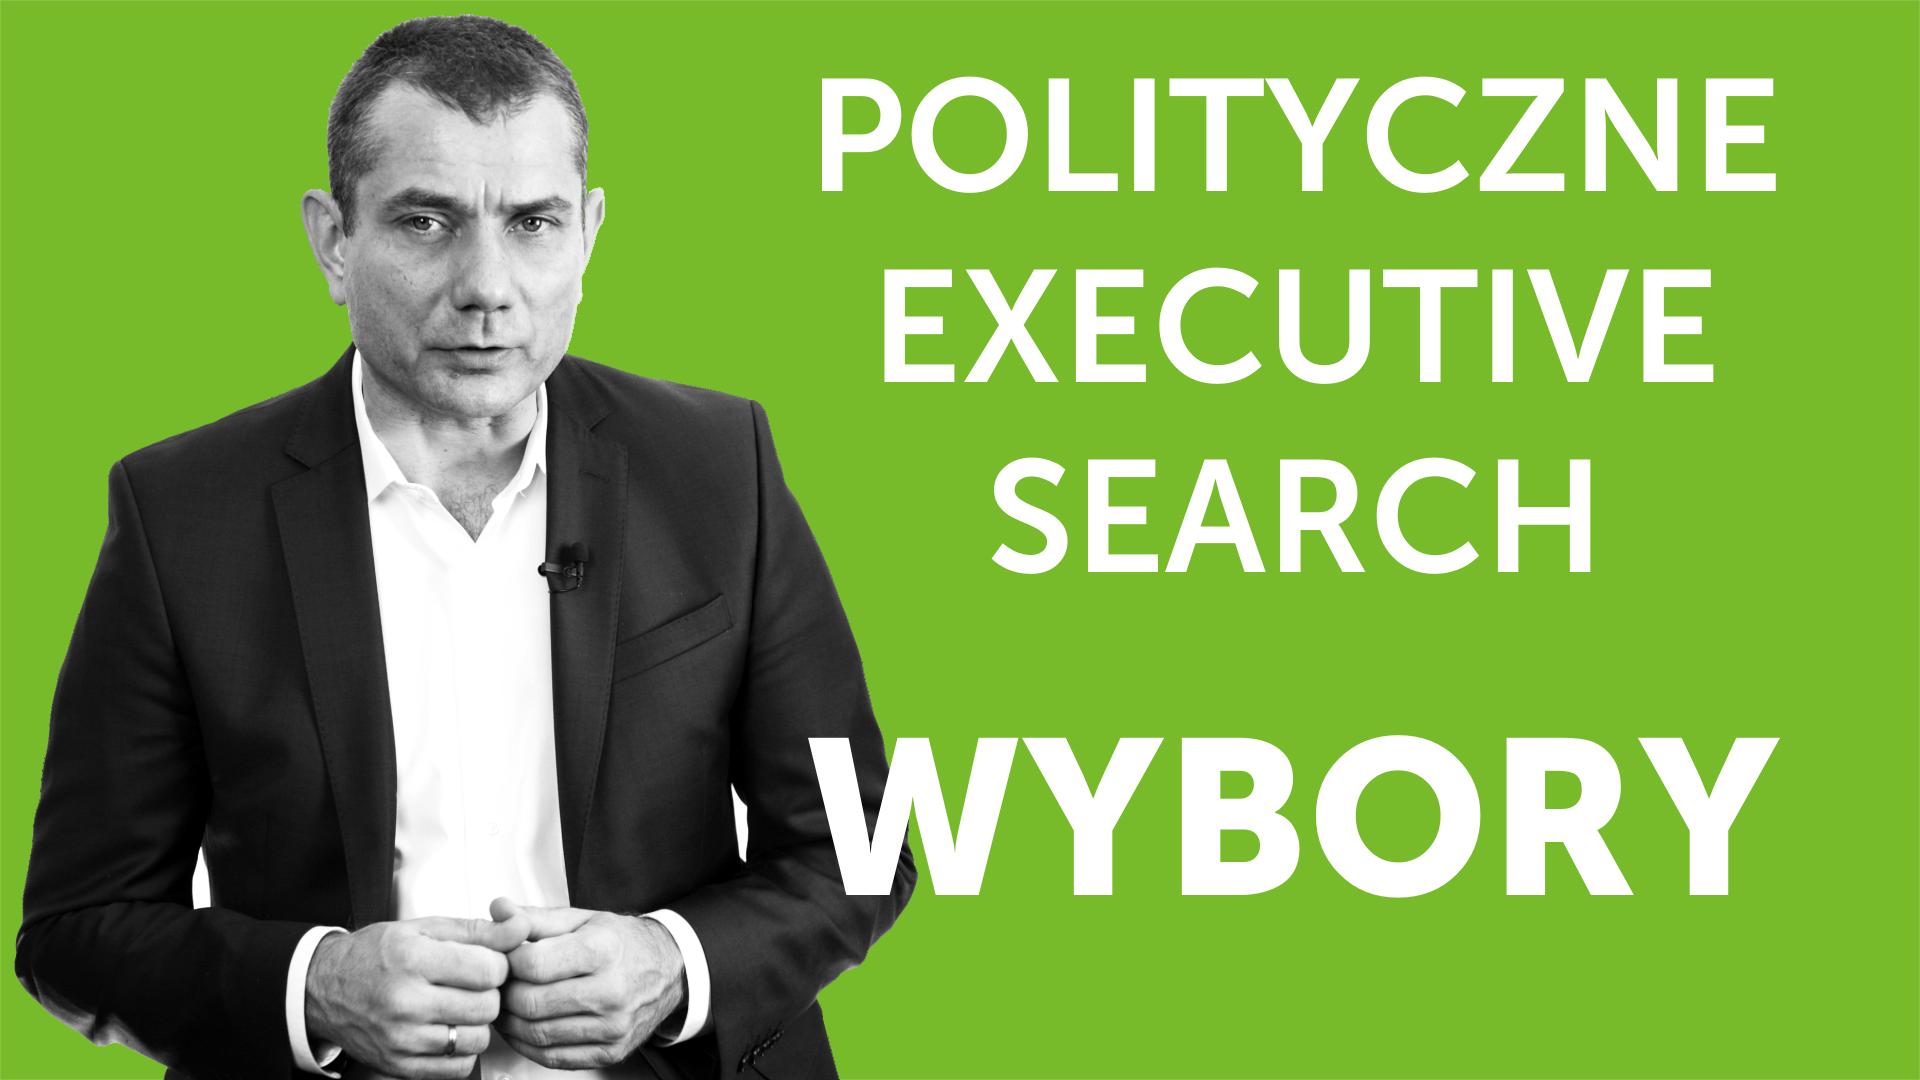 Polityczne Executive Search